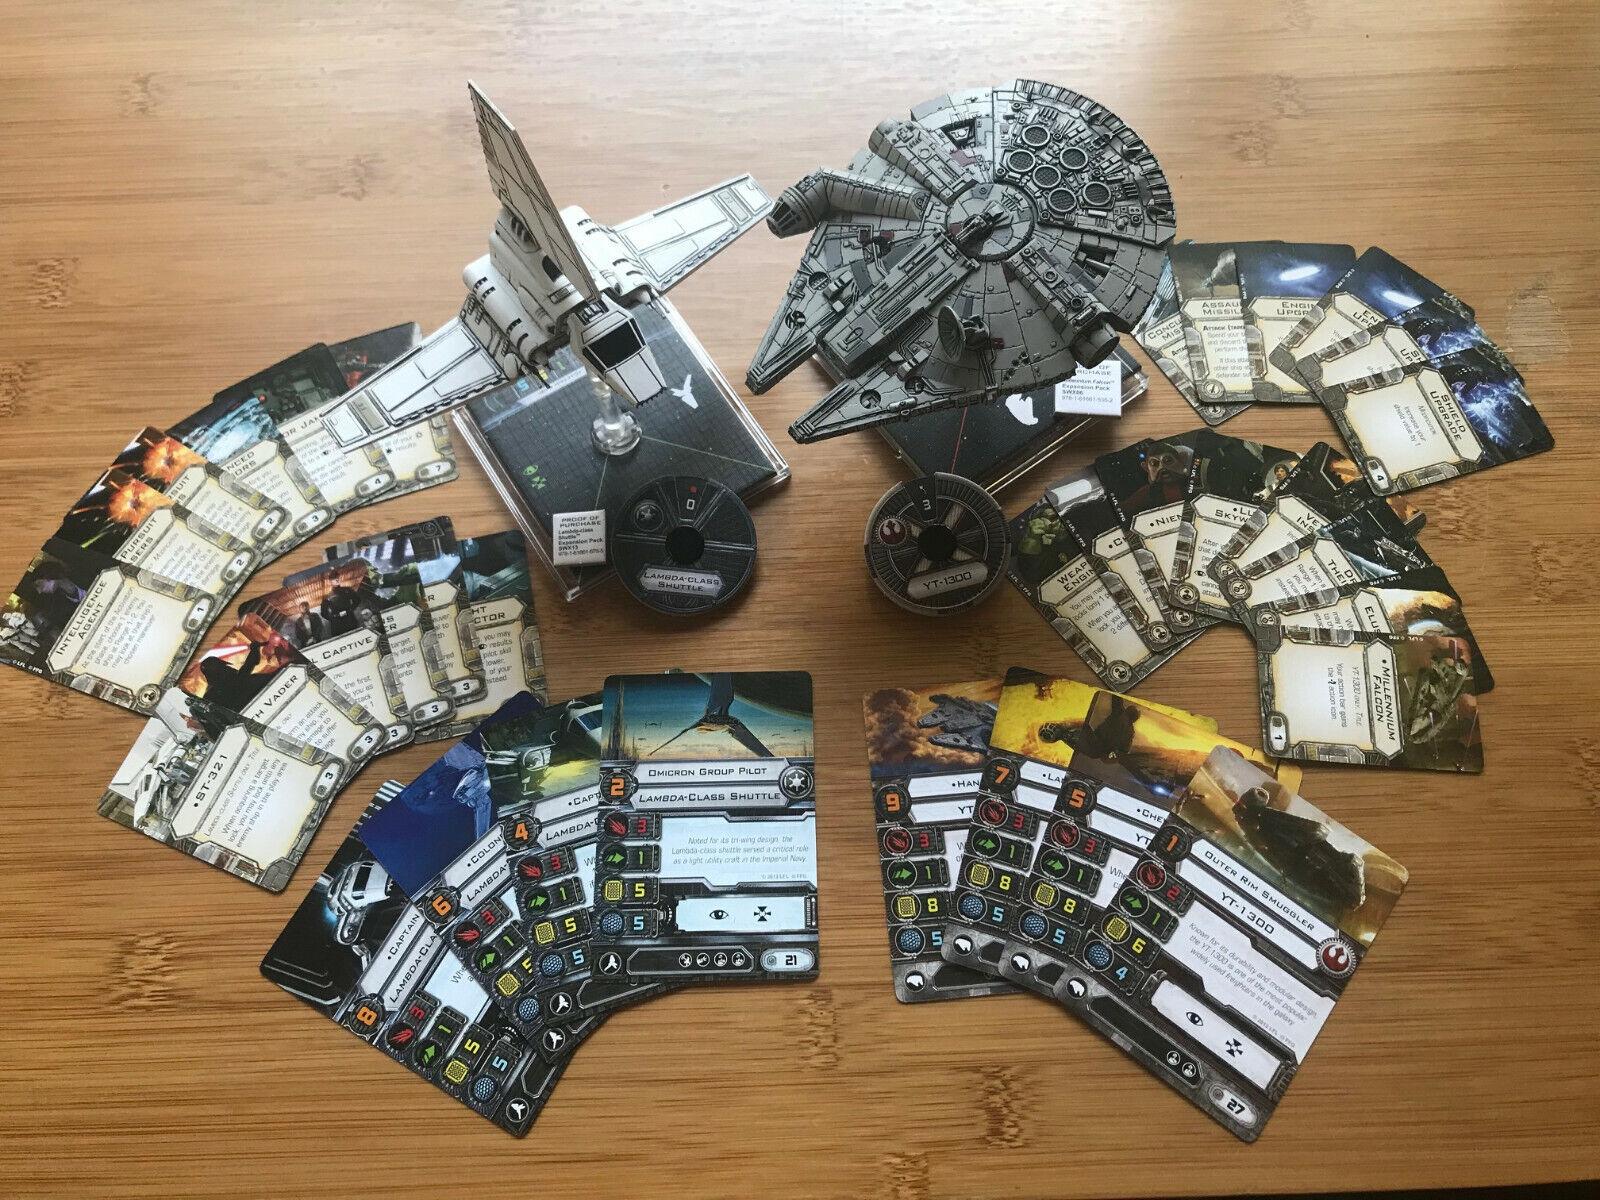 Star Wars X-Wing Combo, Millennium Falcon + Lambda-class Shuttle + KR Multicase